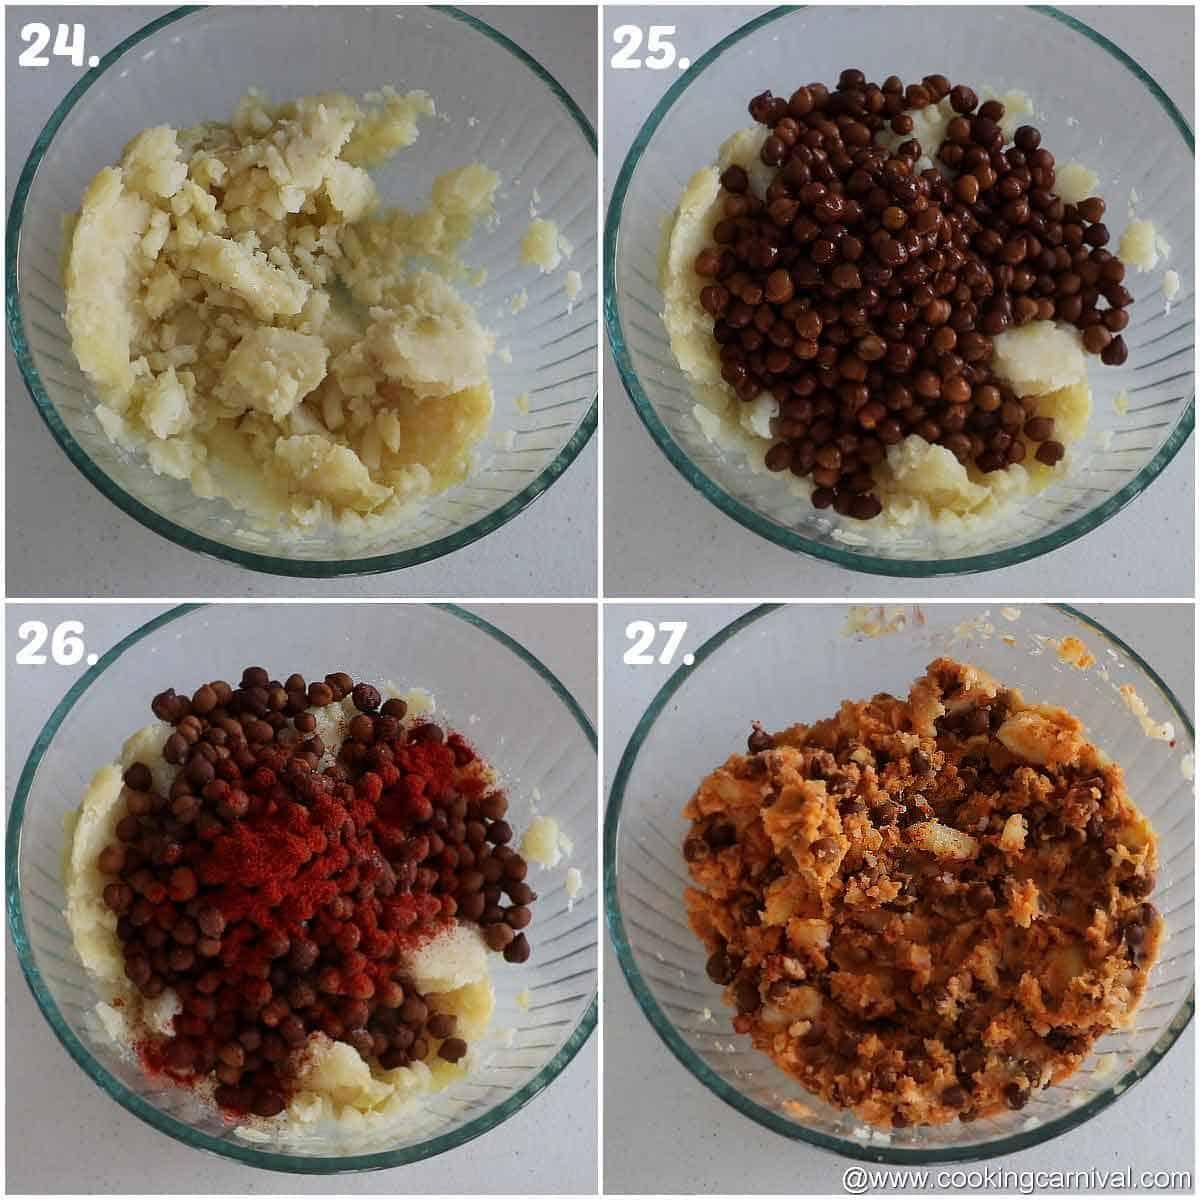 Potato and kala chana mixture with salt and chili powder in bowl